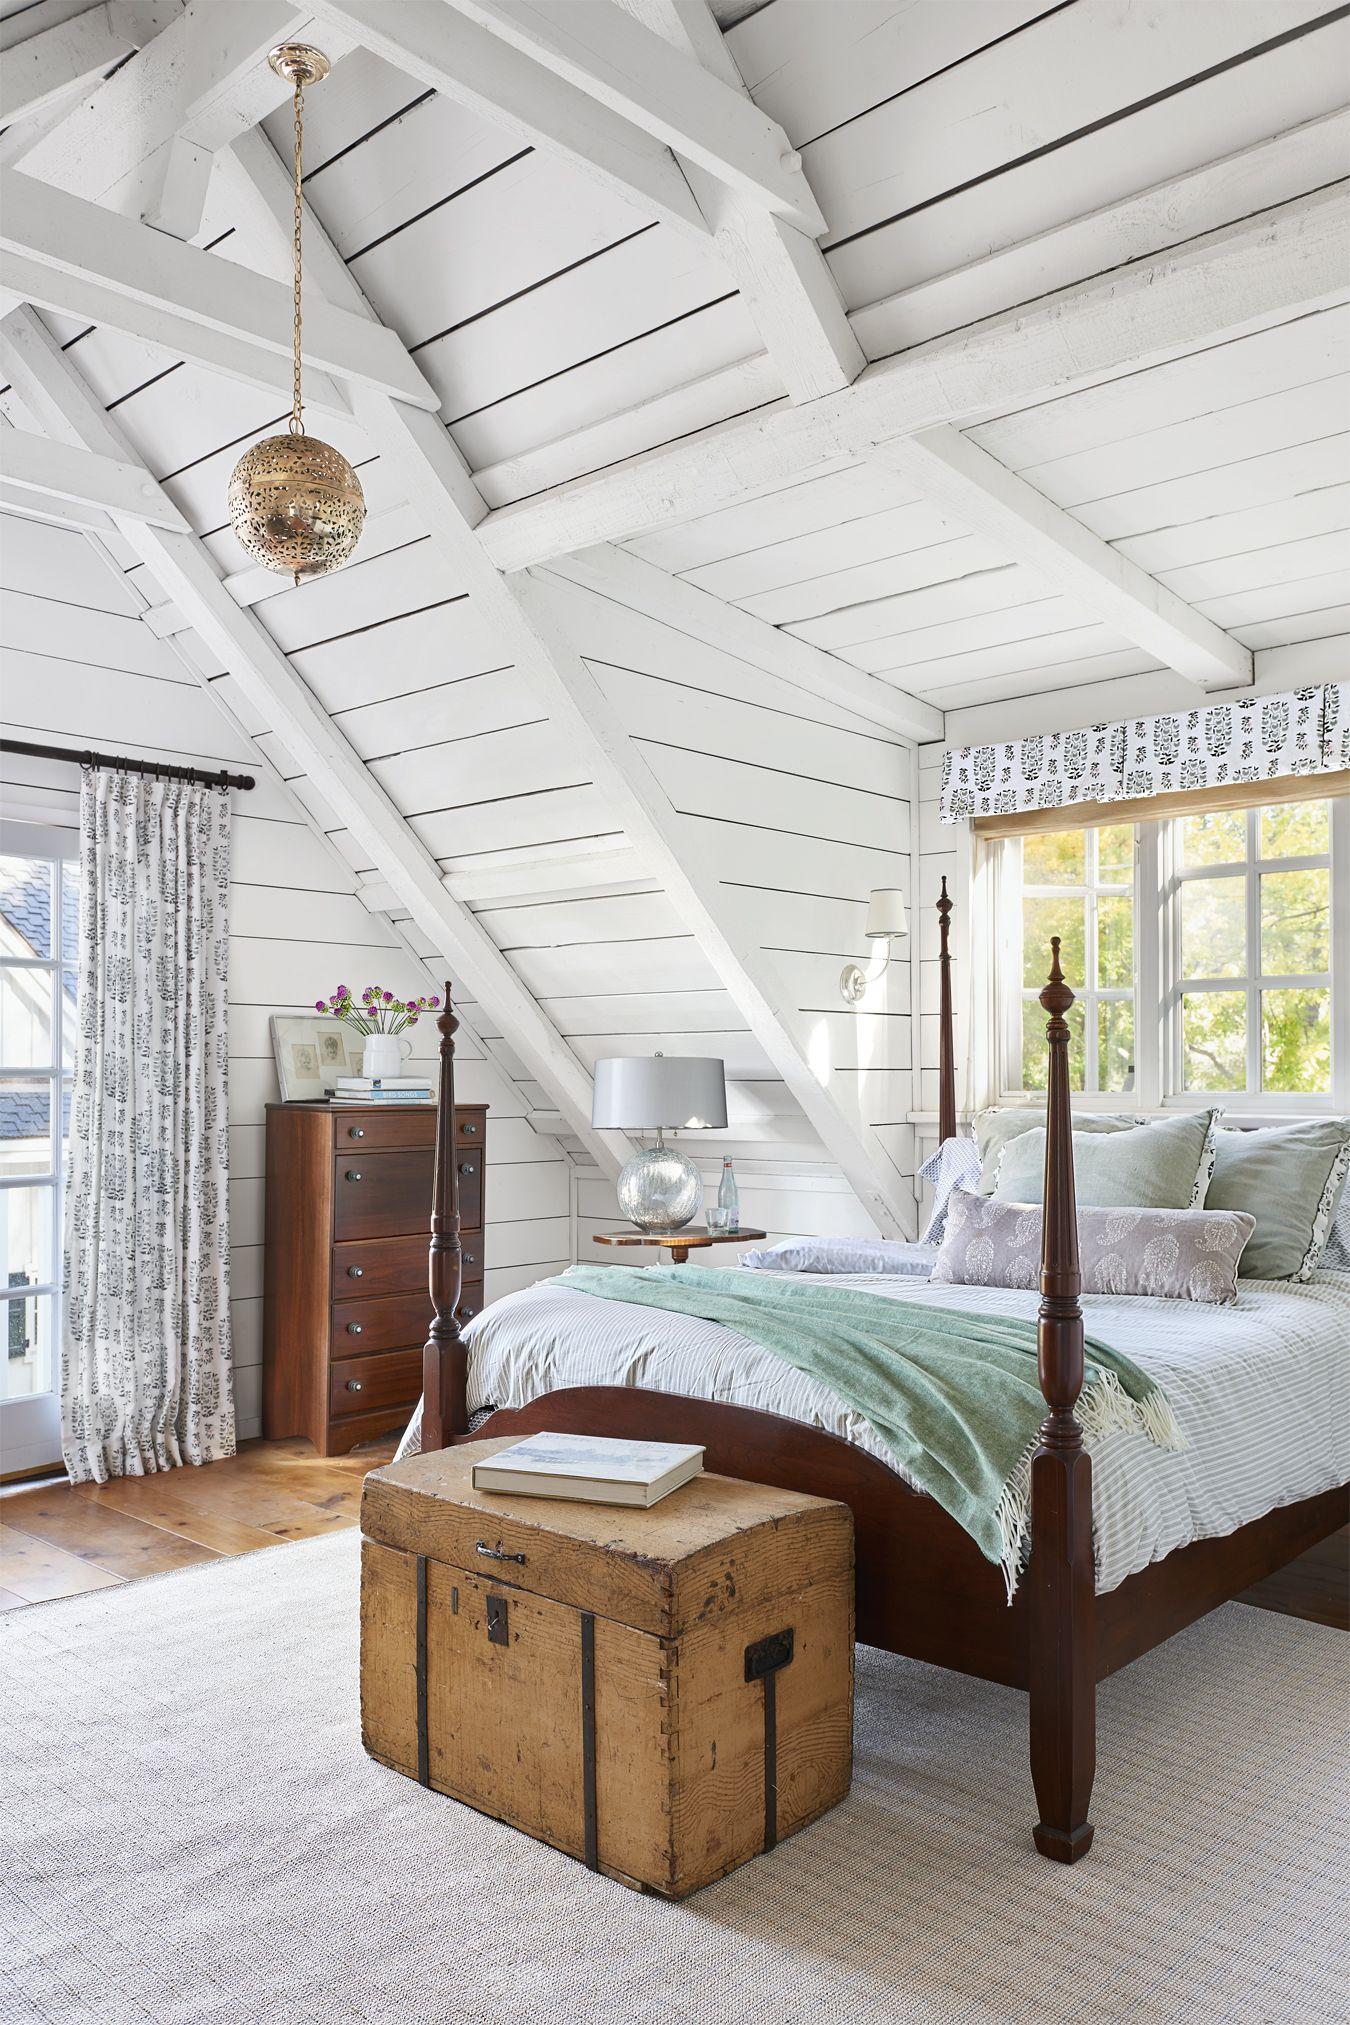 cozy bedroom ideas - shiplap & 100+ Bedroom Decorating Ideas in 2019 - Designs for Beautiful Bedrooms